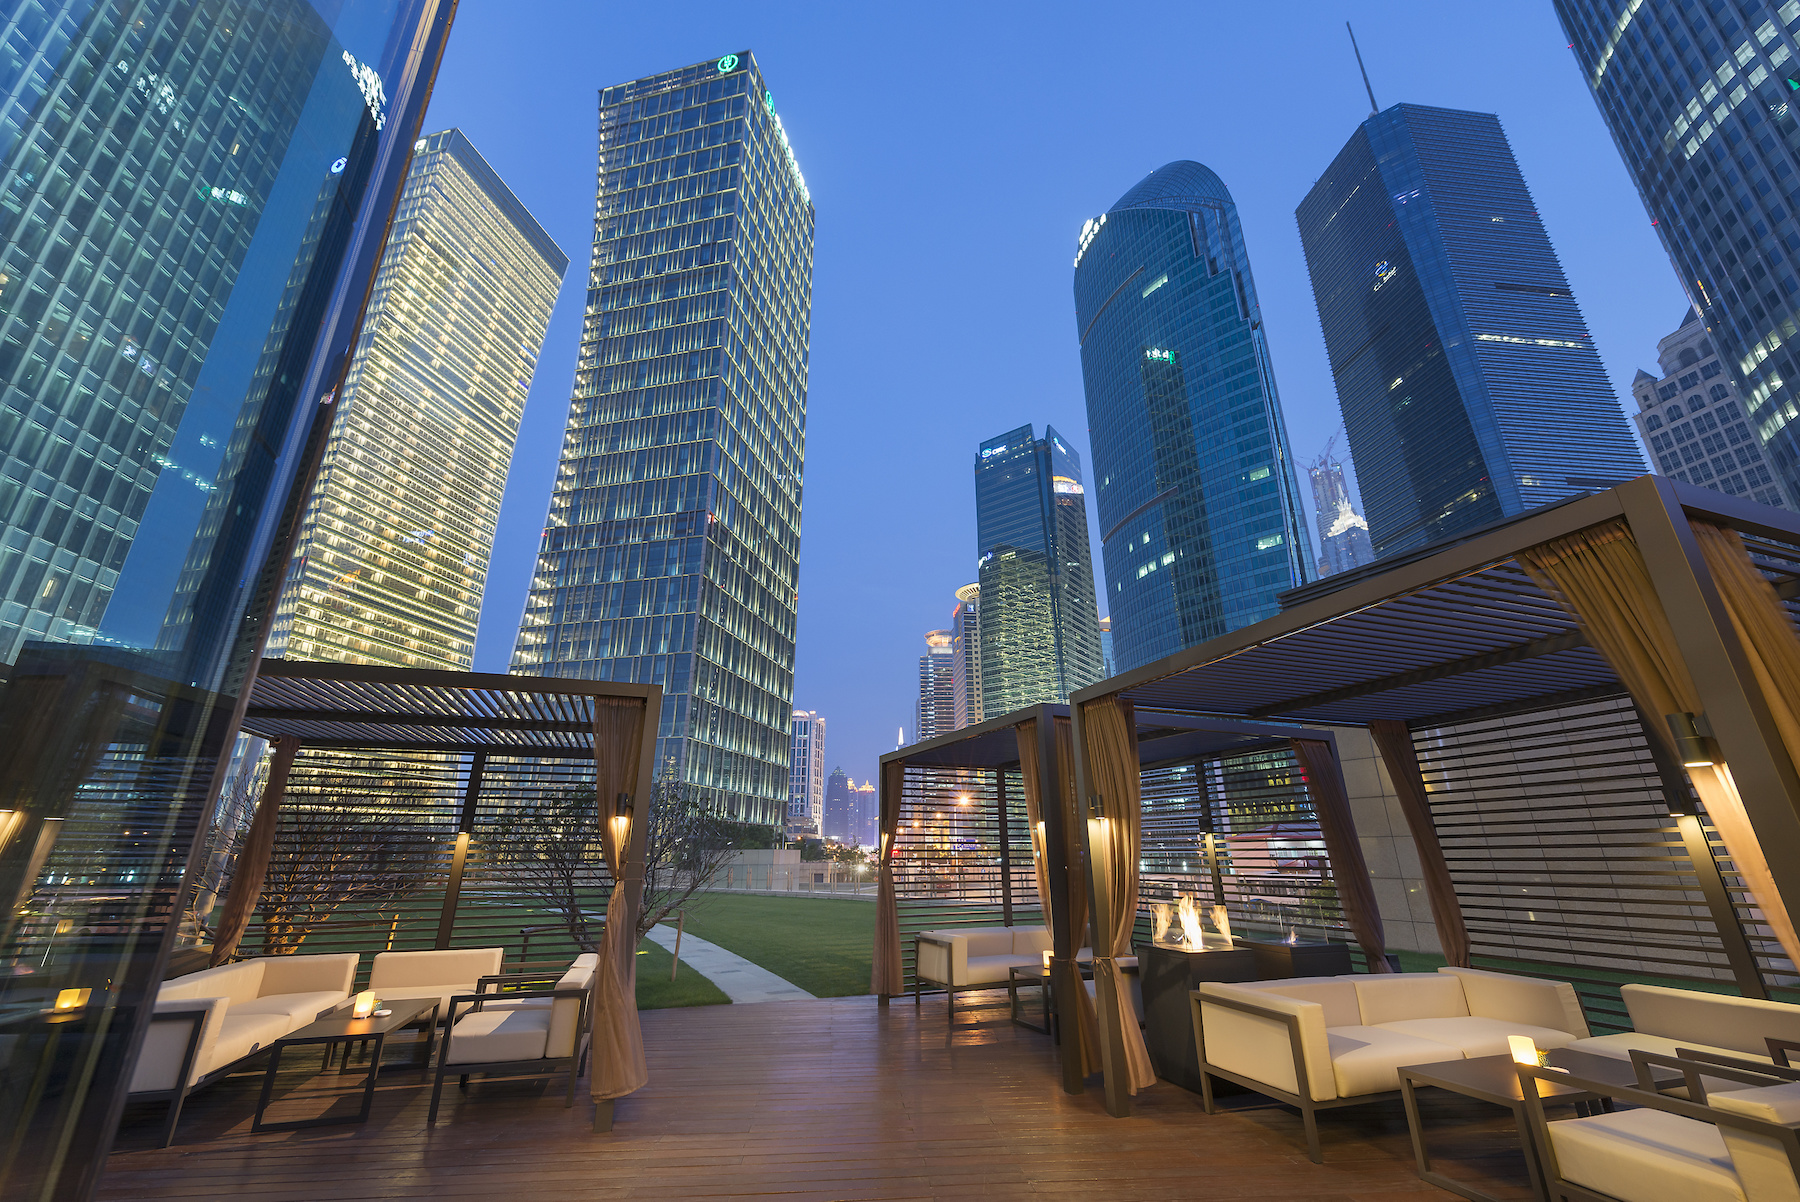 shanghai-fine-dining-qi-bar-terrace-01.jpg